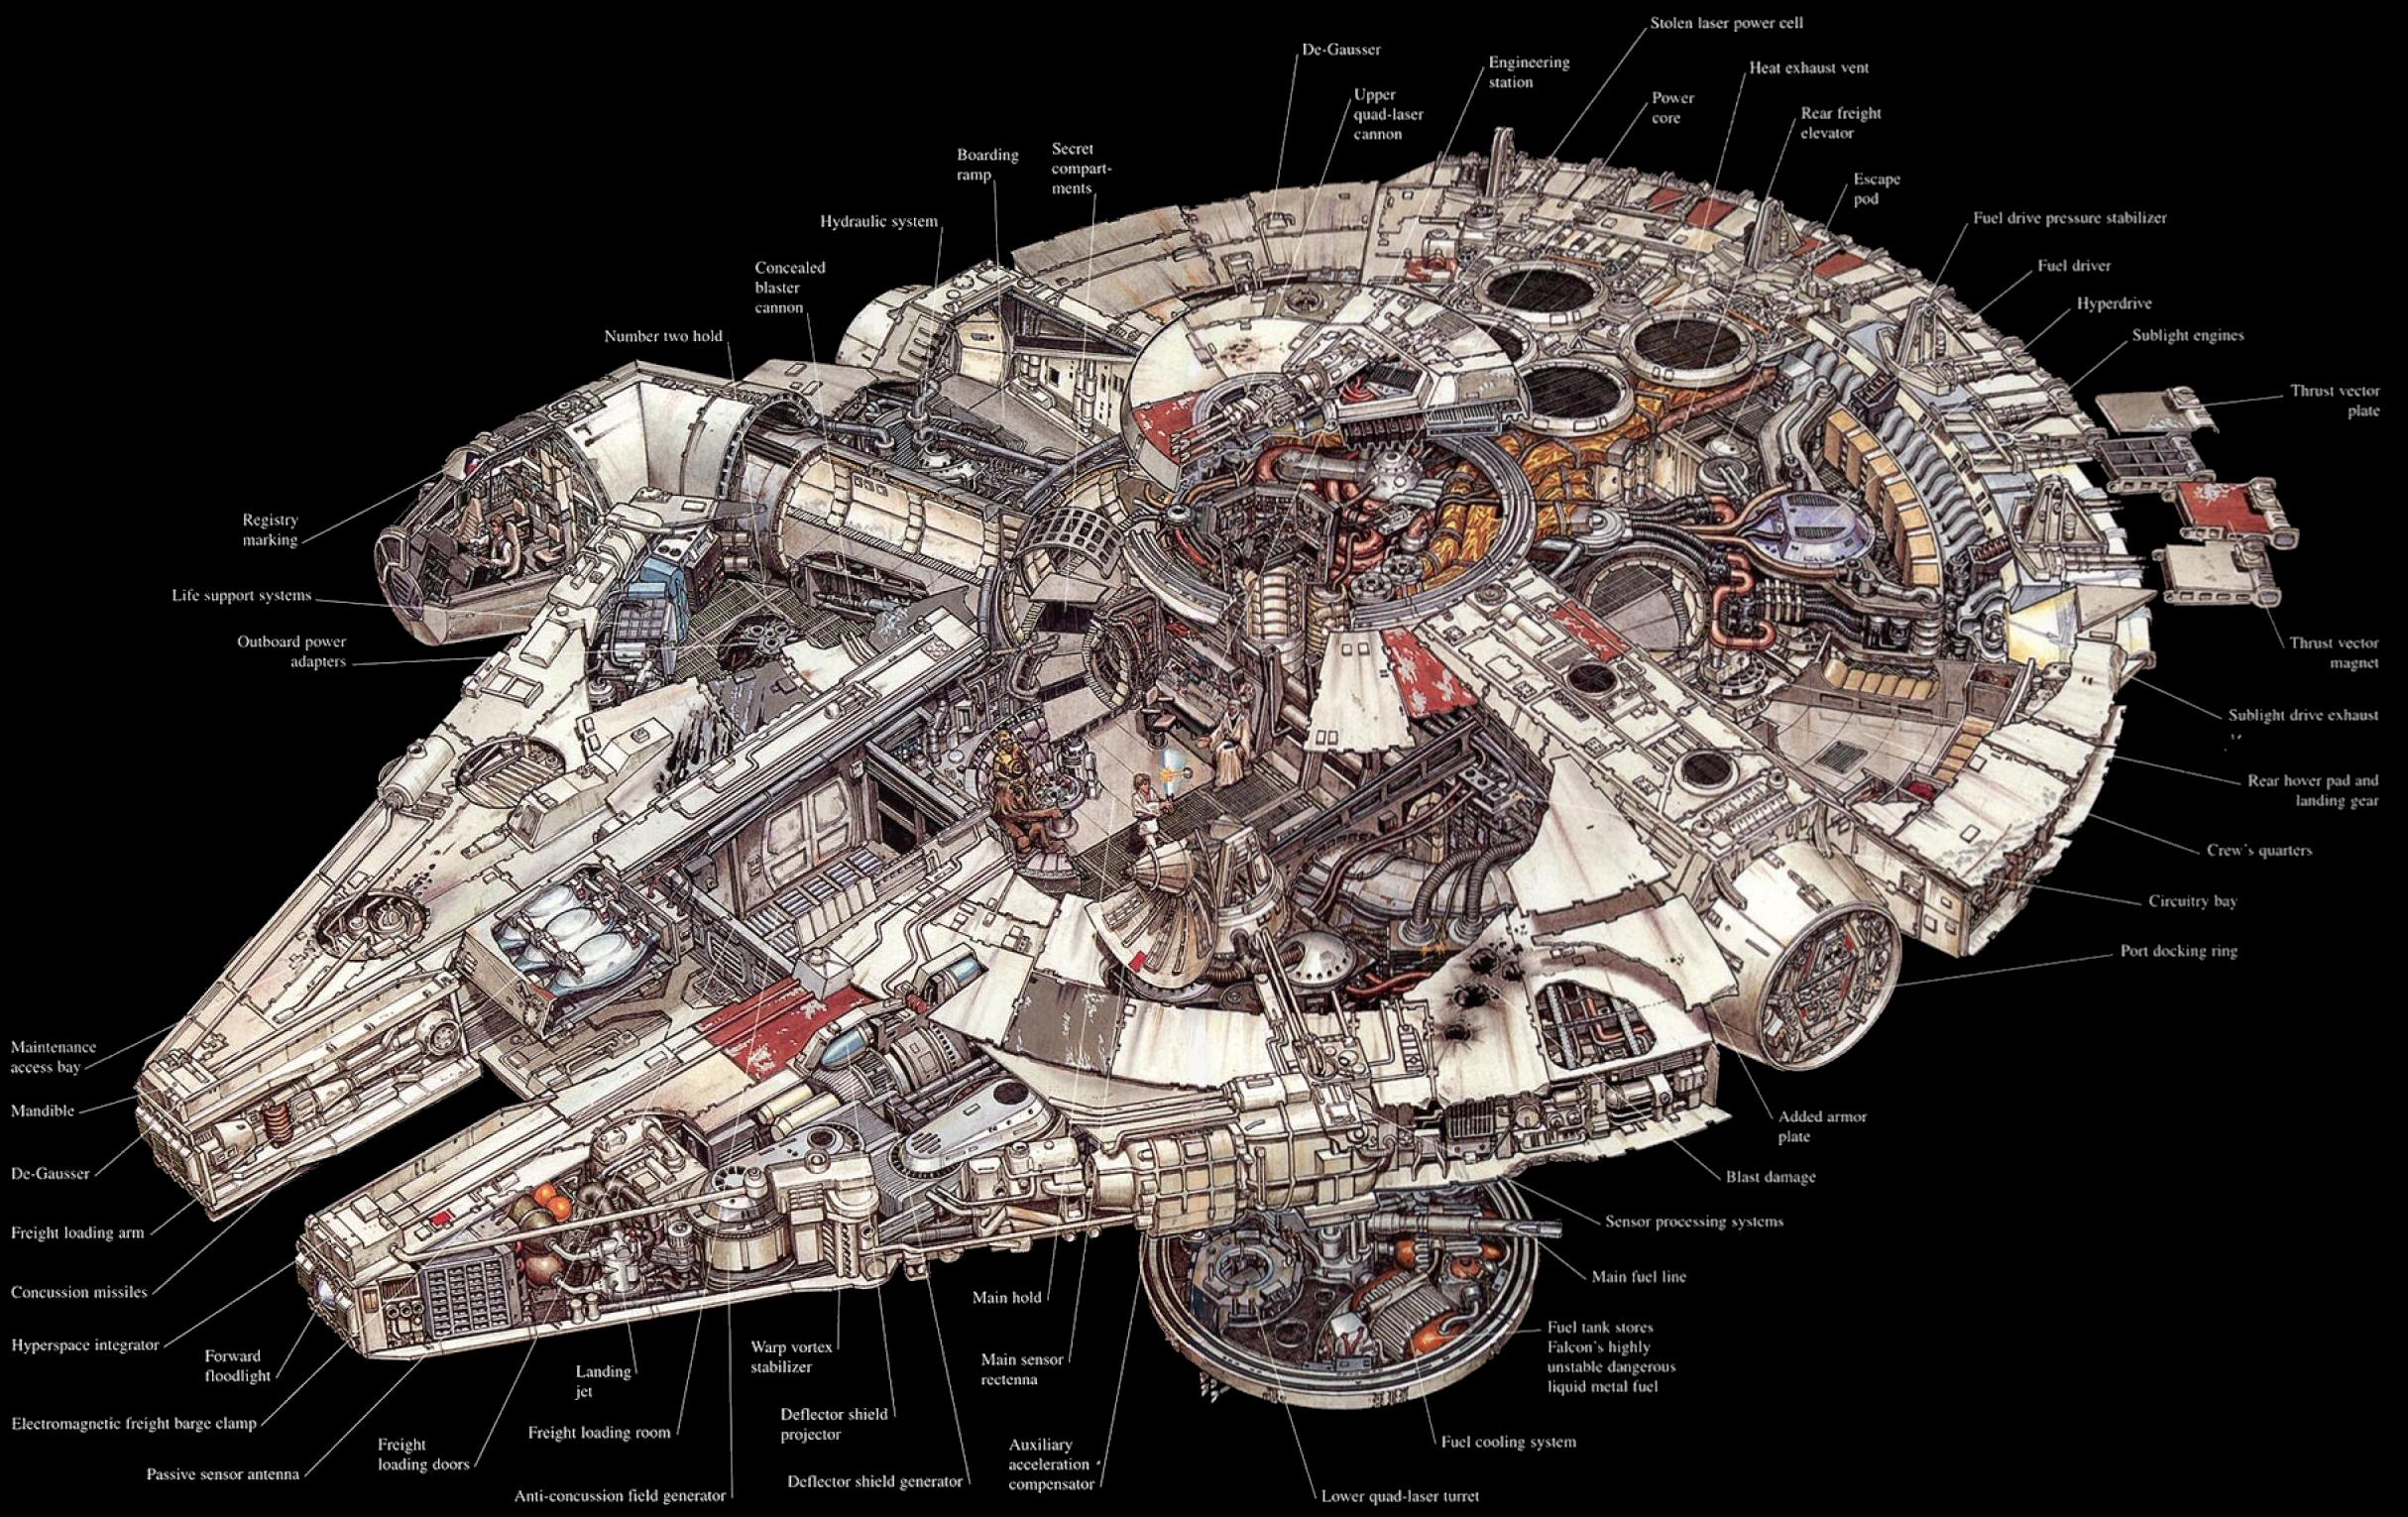 2429x1530 Ship] Millennium Falcon